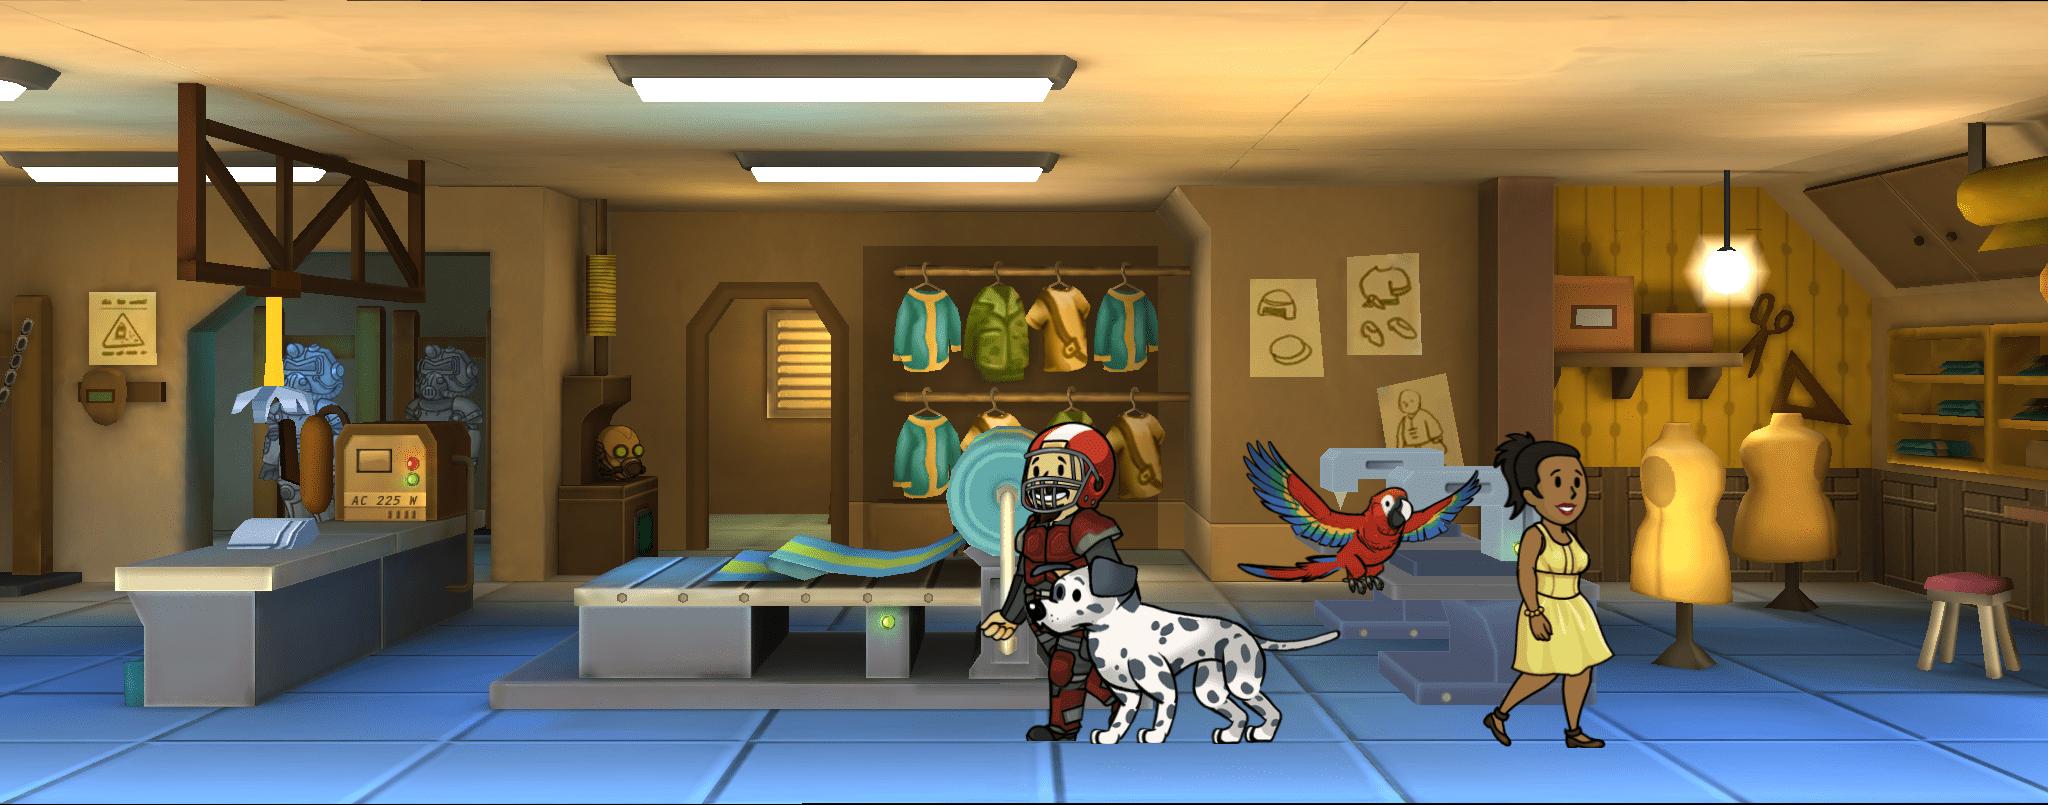 Fallout_Shelter_1_1456738107.4_Update_Pets